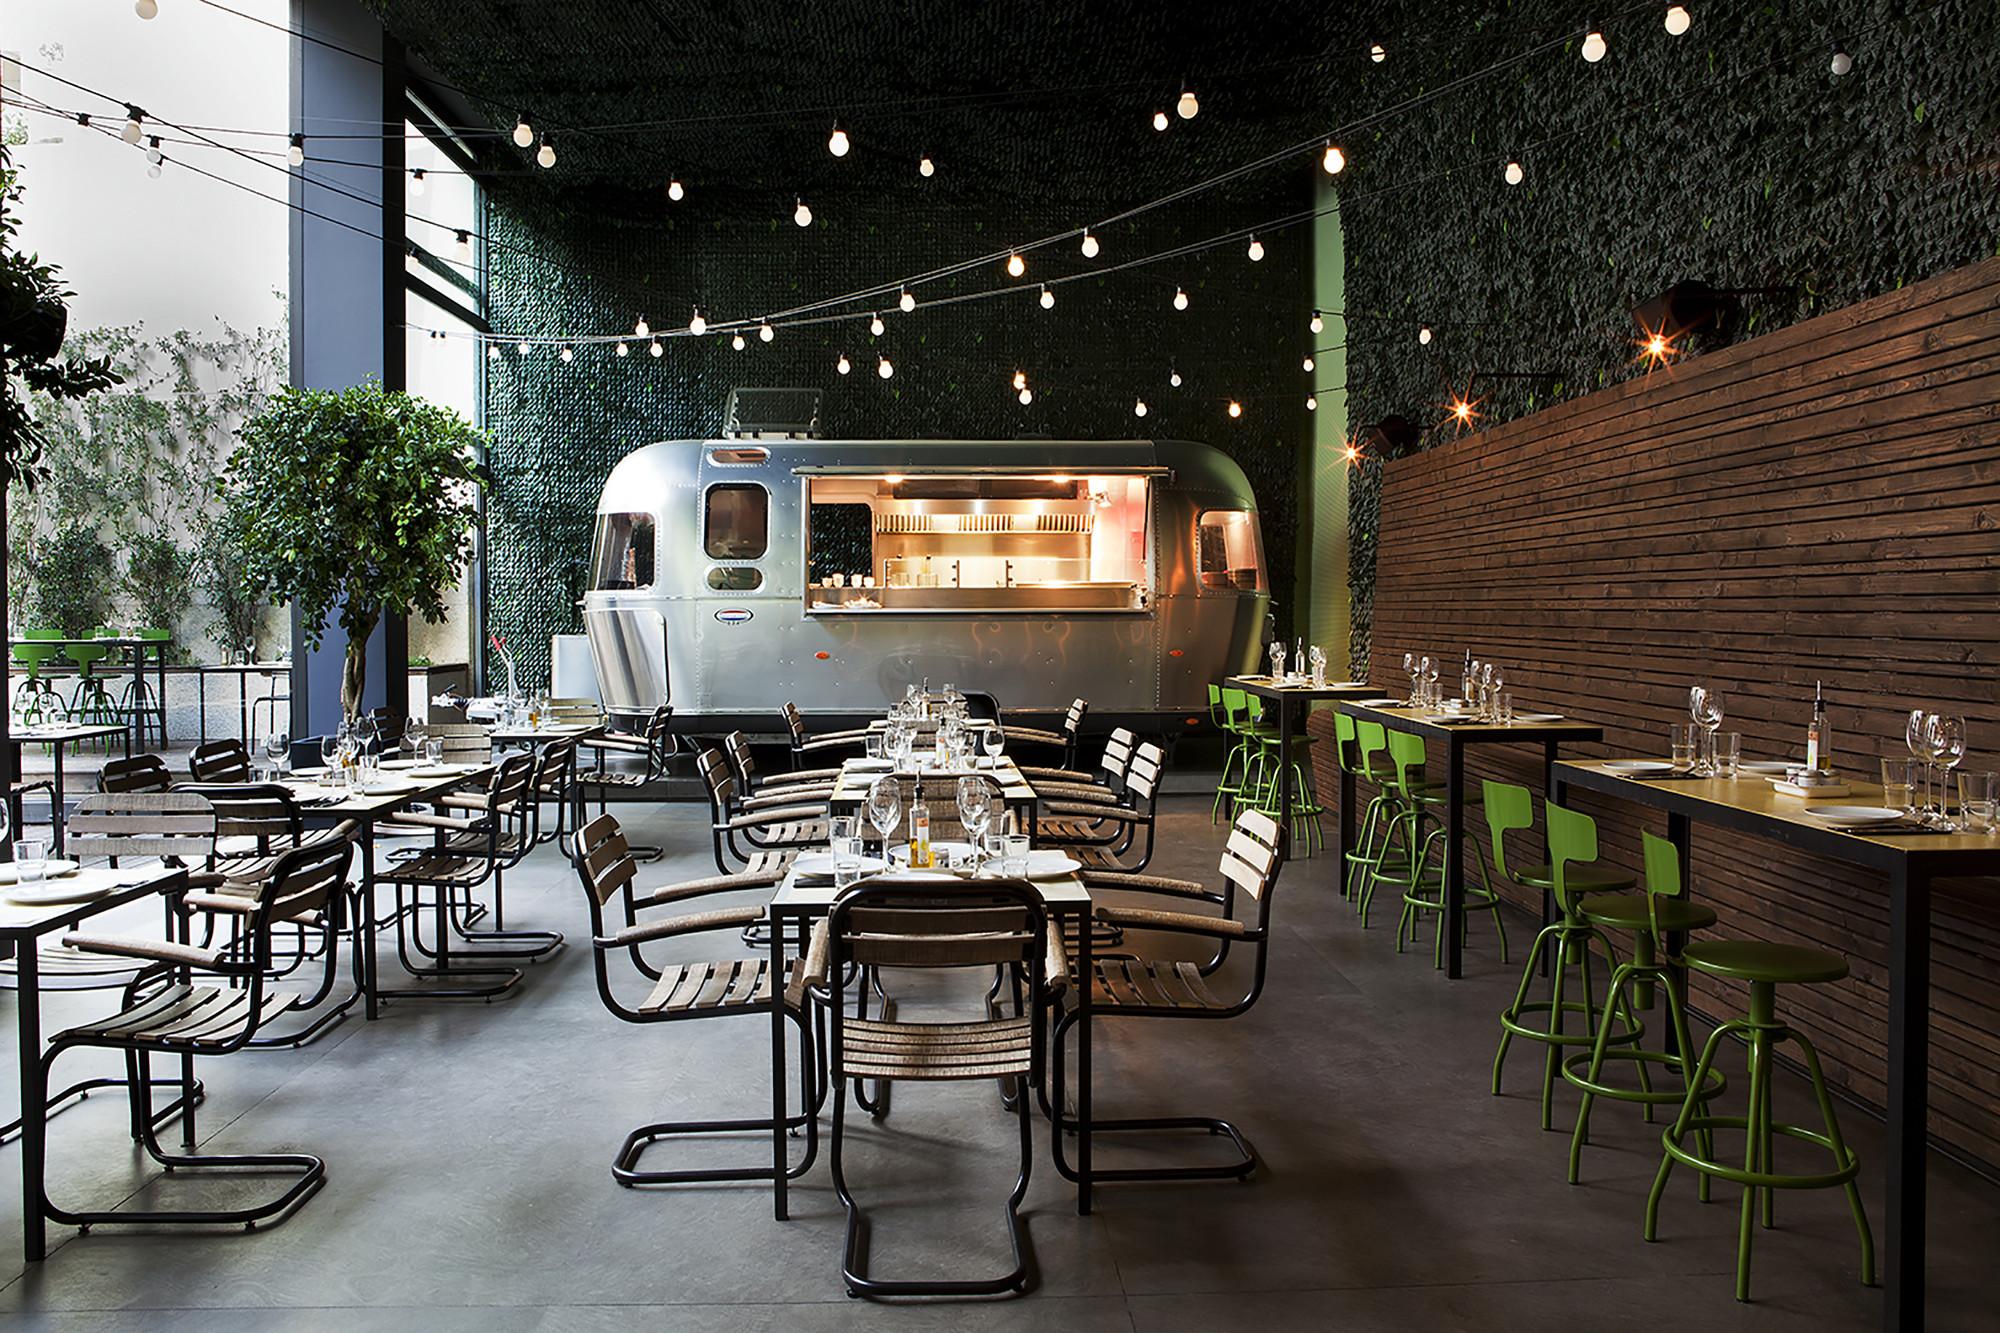 Urban restaurant photo